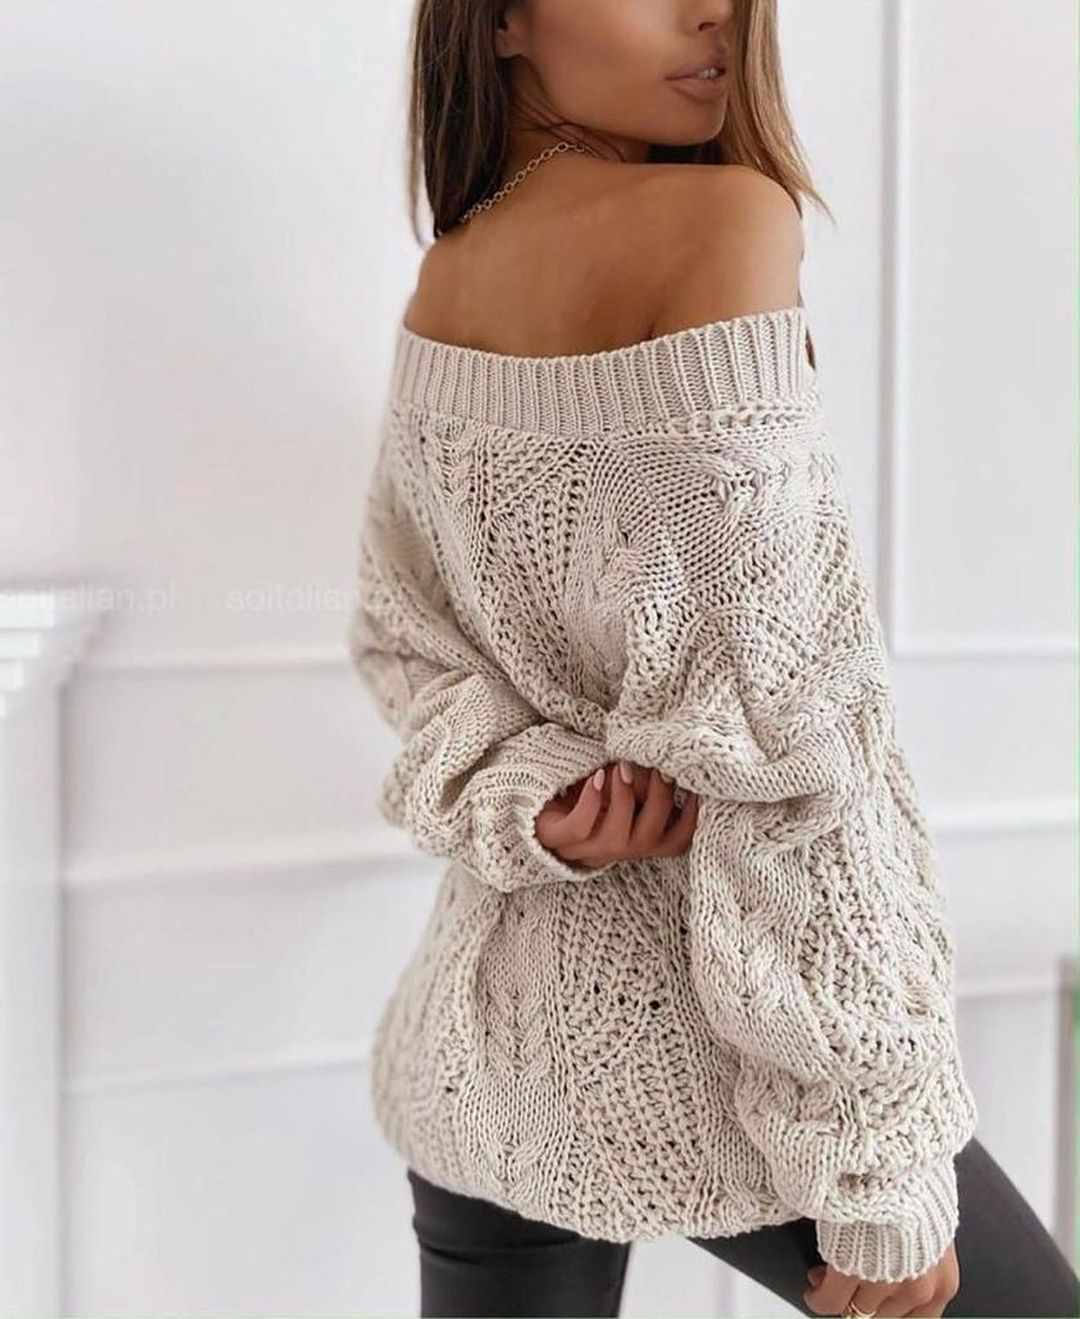 🌼🌼Free Size #top #onlineshopping #shop #shopping #model #modeling #mood #colors #price #perfect #fashion #fashionstyle #madeinturkey🇹🇷 #female #elegance